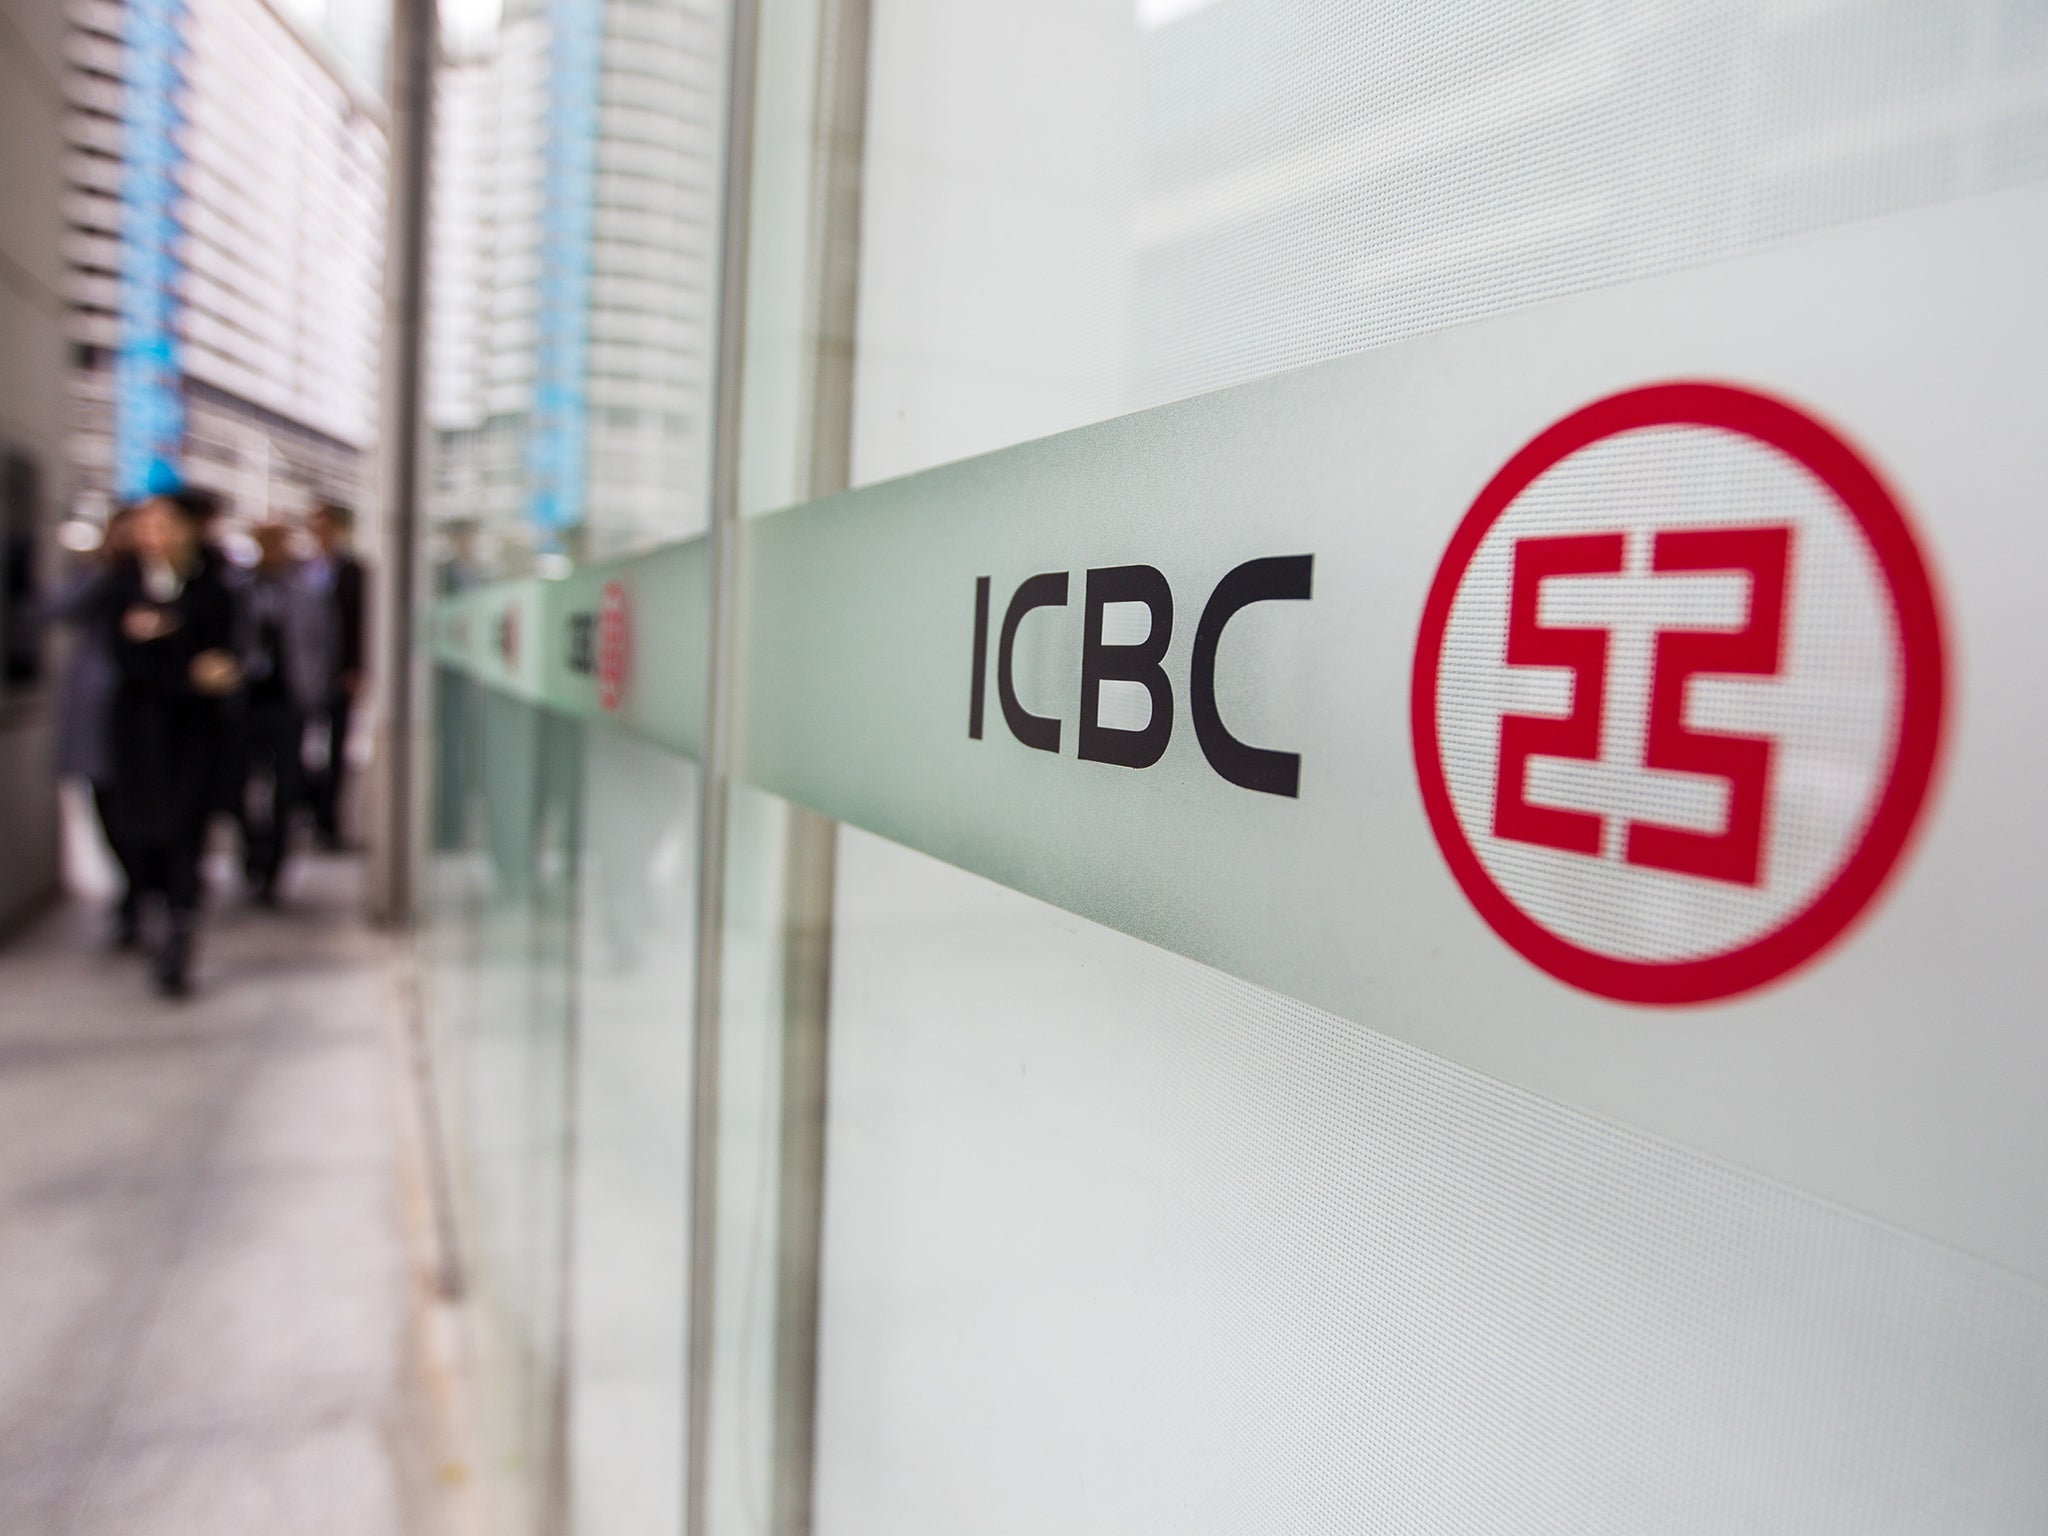 Icbc Travel Insurance